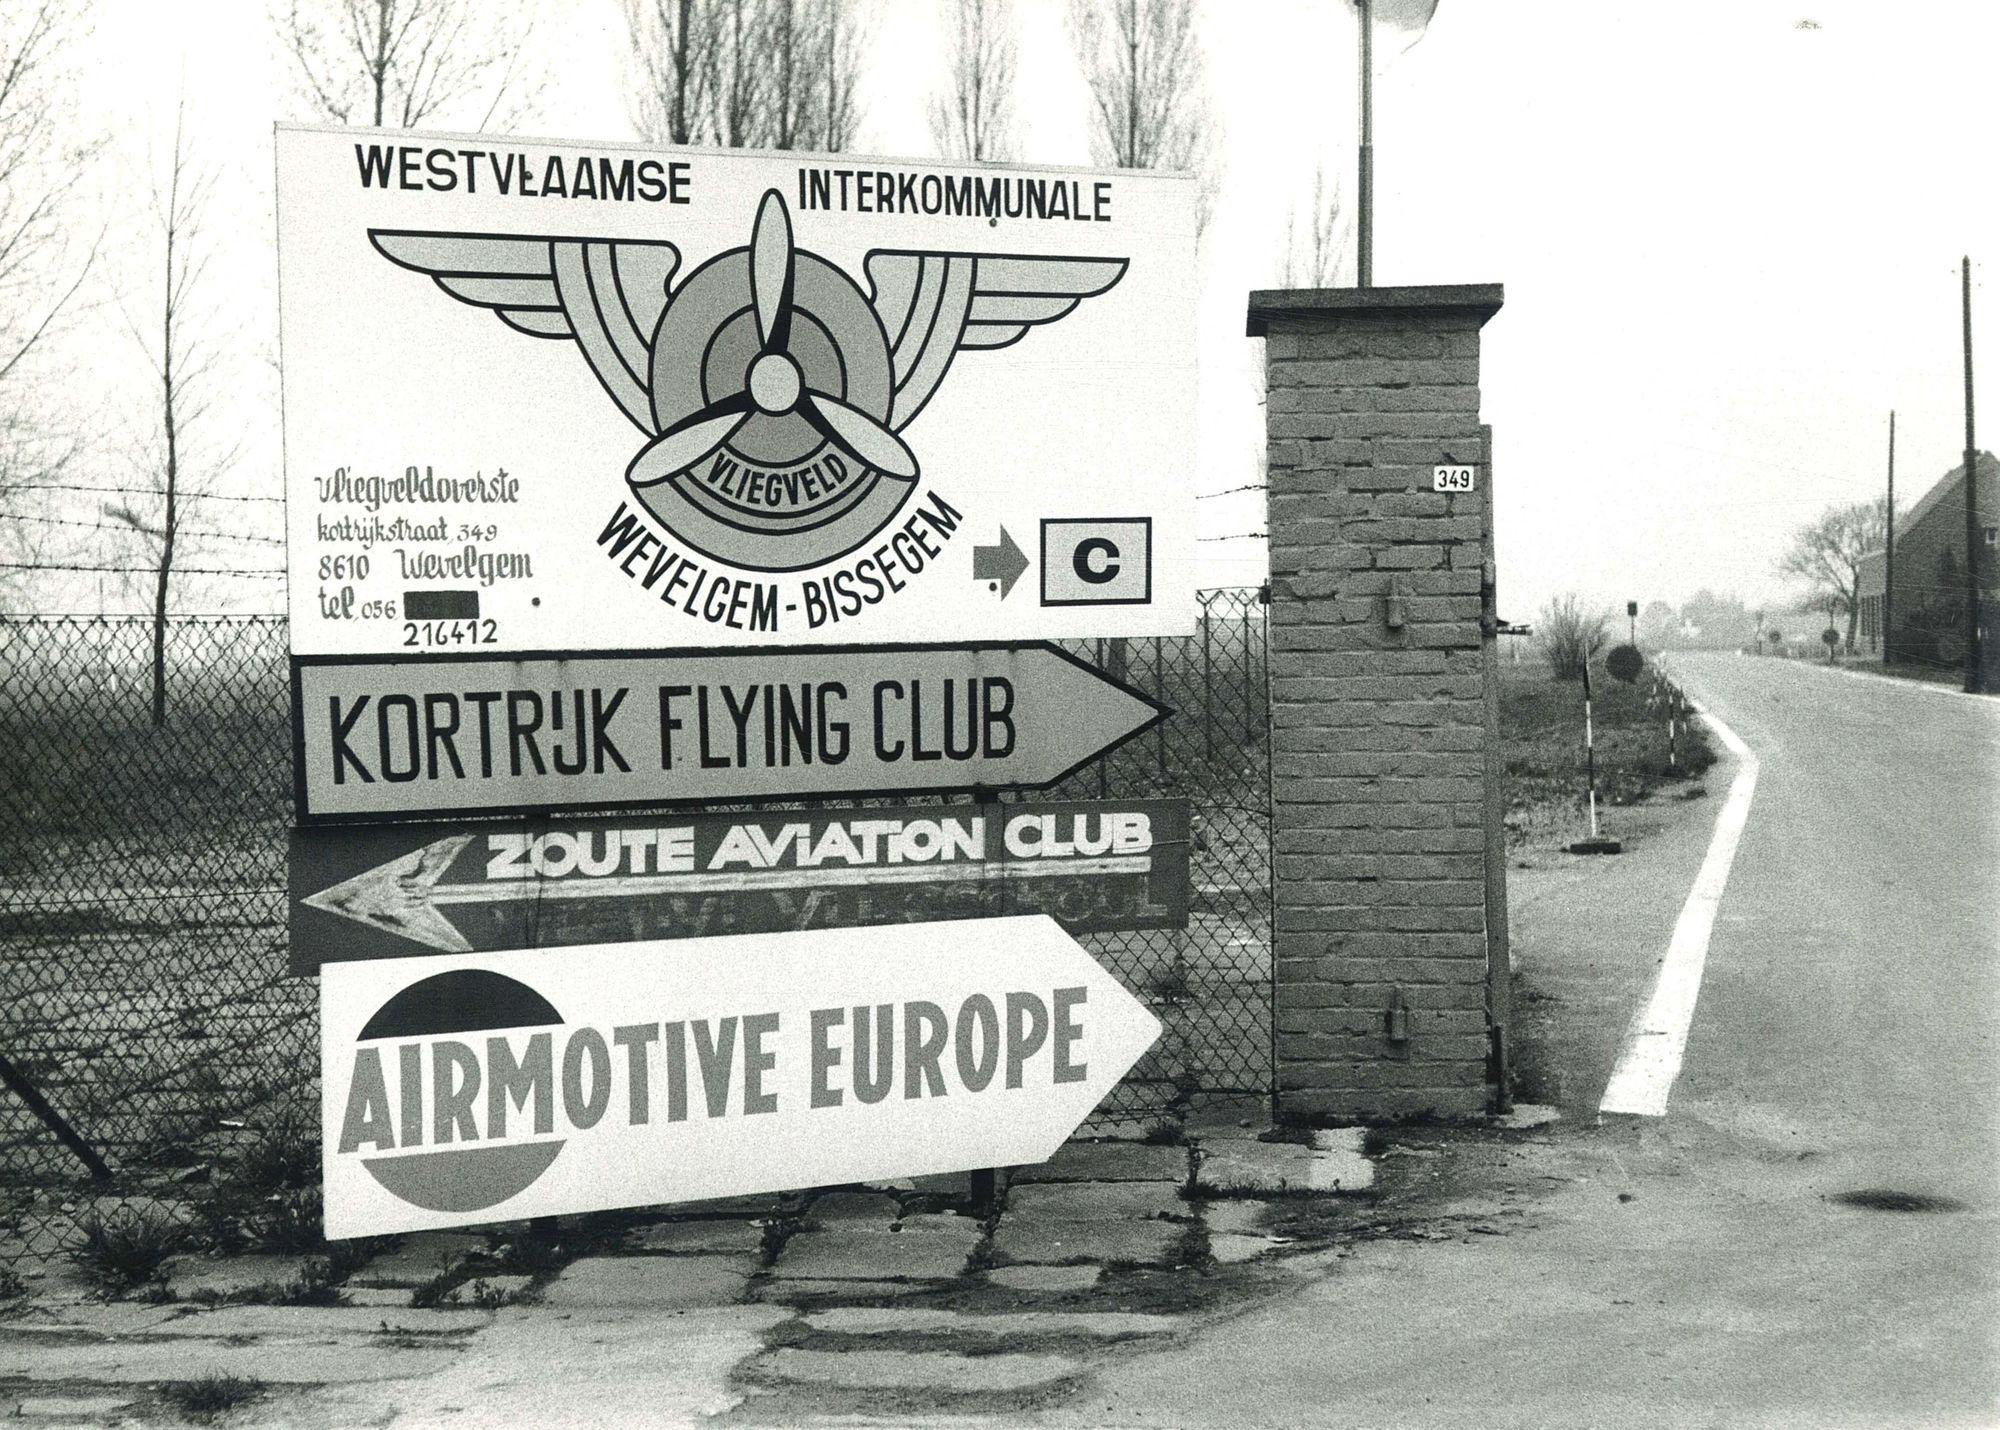 Kortrijk Flying Club